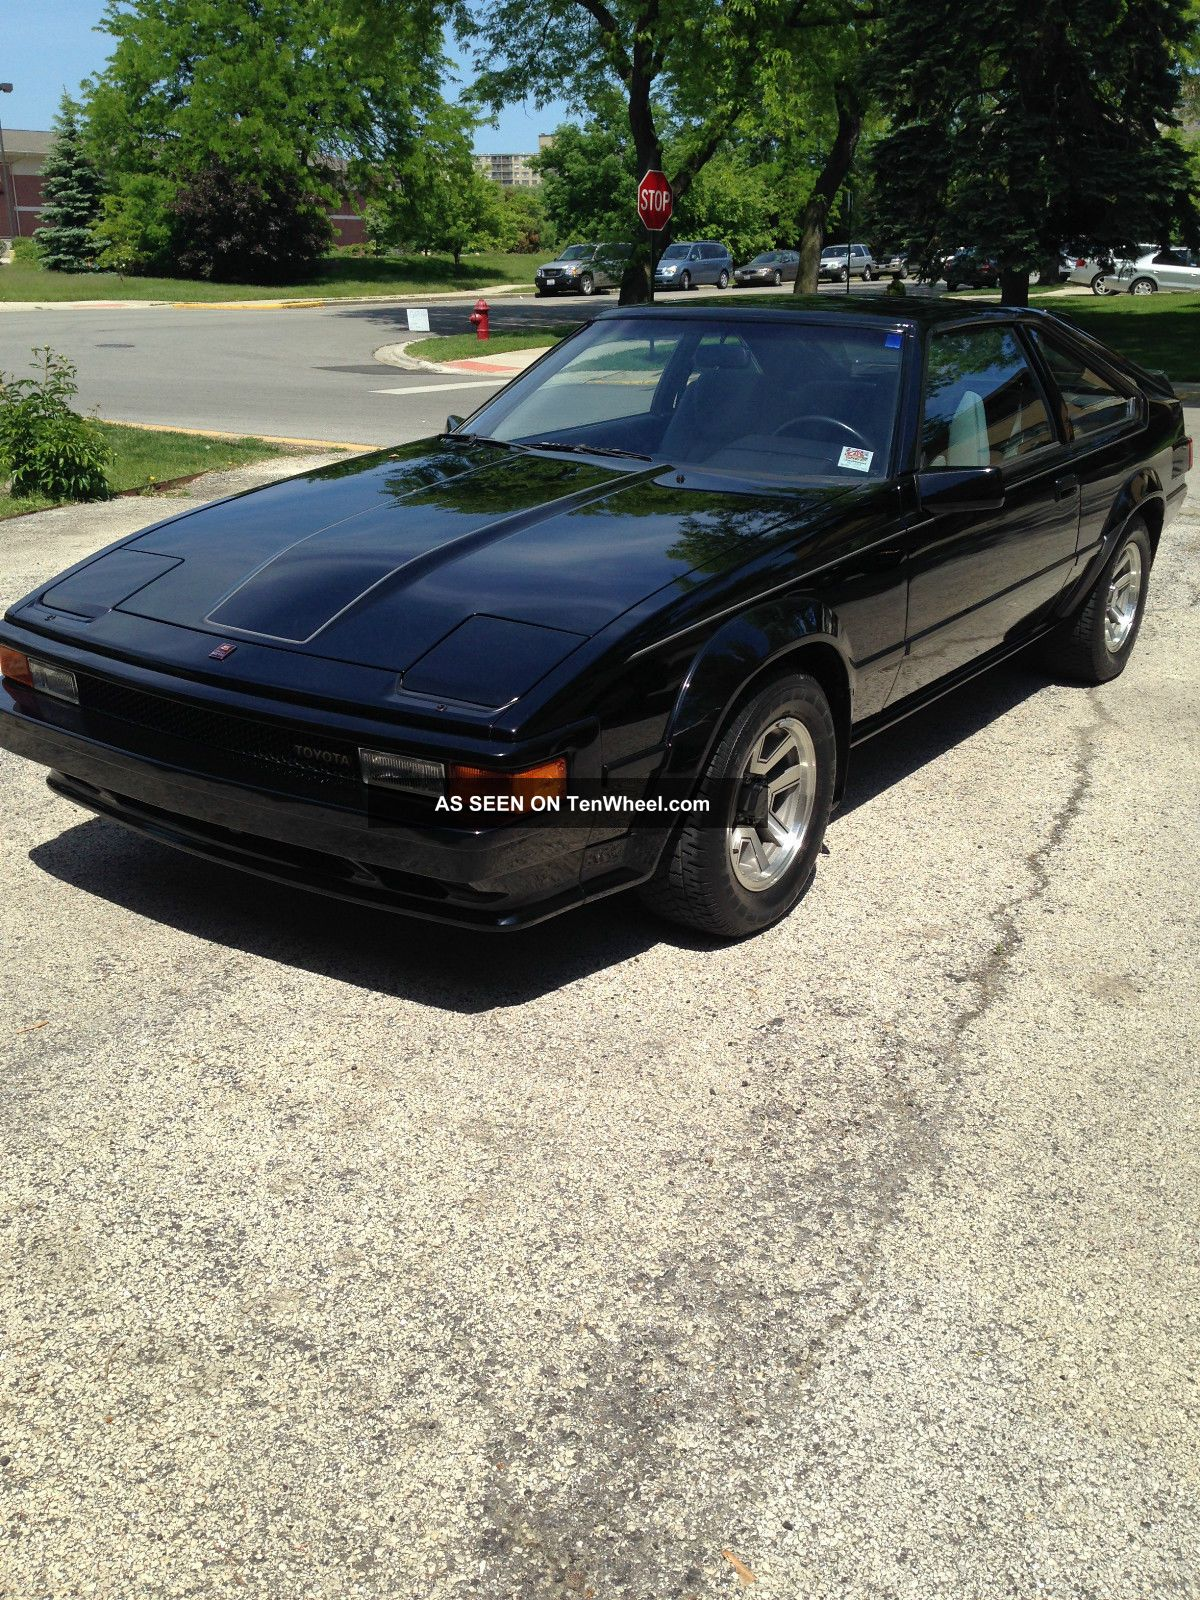 1985 1986 Toyota Supra Rare Manual 5 Speed